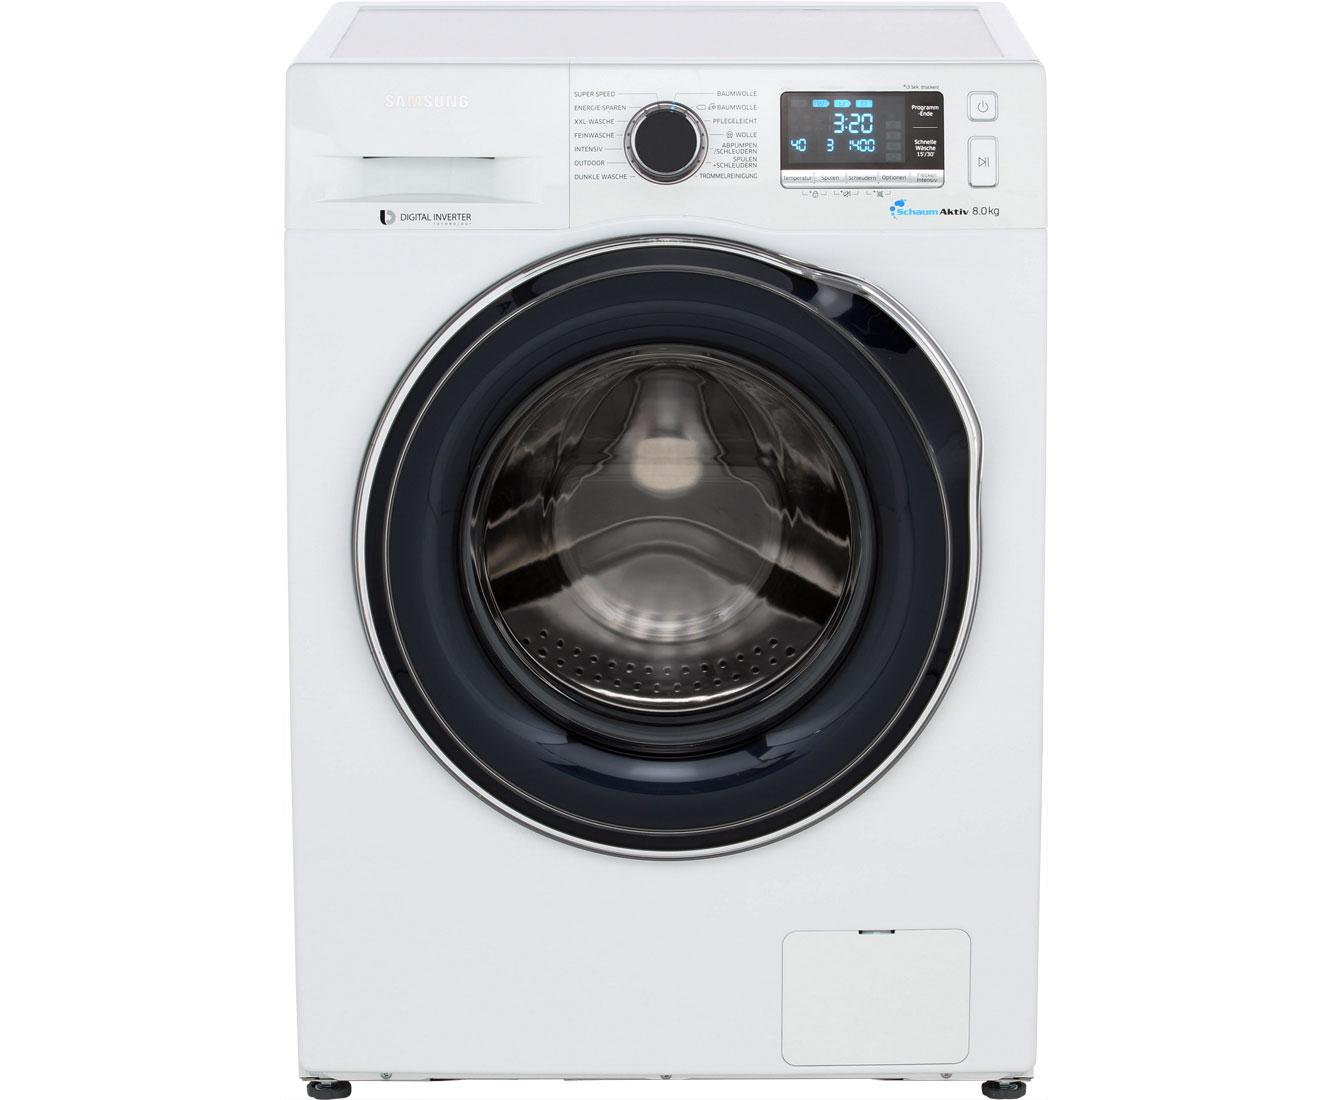 Samsung WW80J6400CWEG Waschmaschine 8 kg, 1400 U/Min, A+++